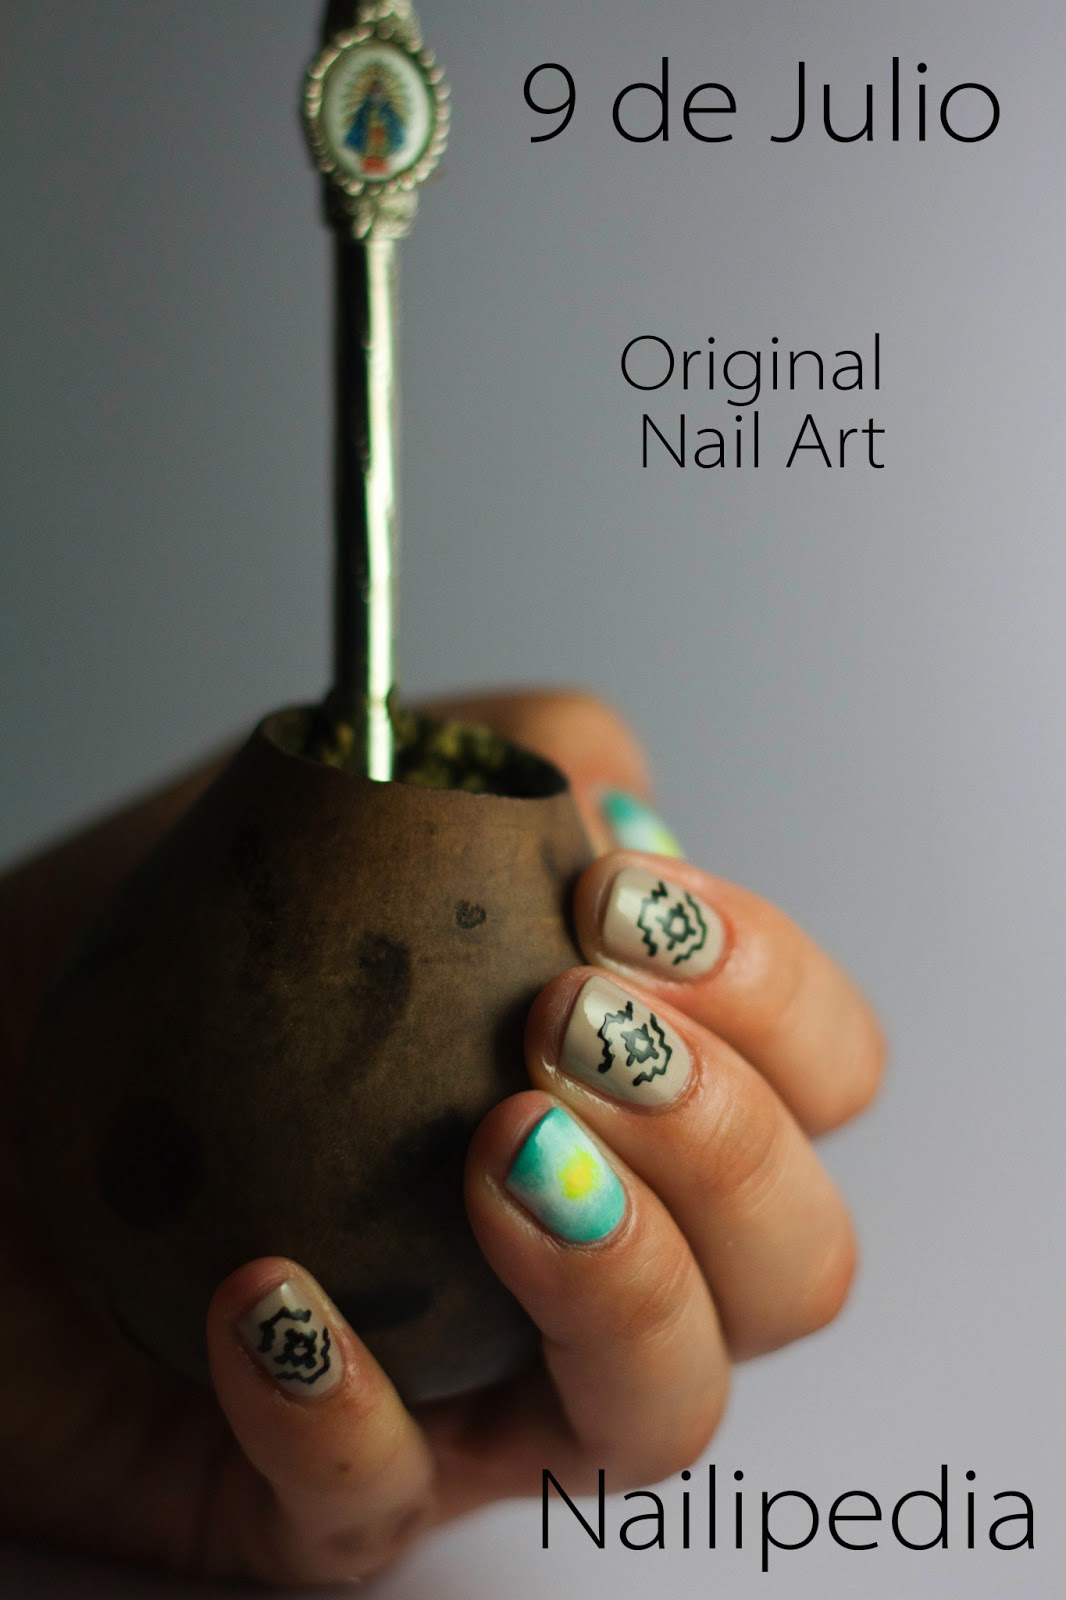 nailipedia 9 de julio original nail art. Black Bedroom Furniture Sets. Home Design Ideas